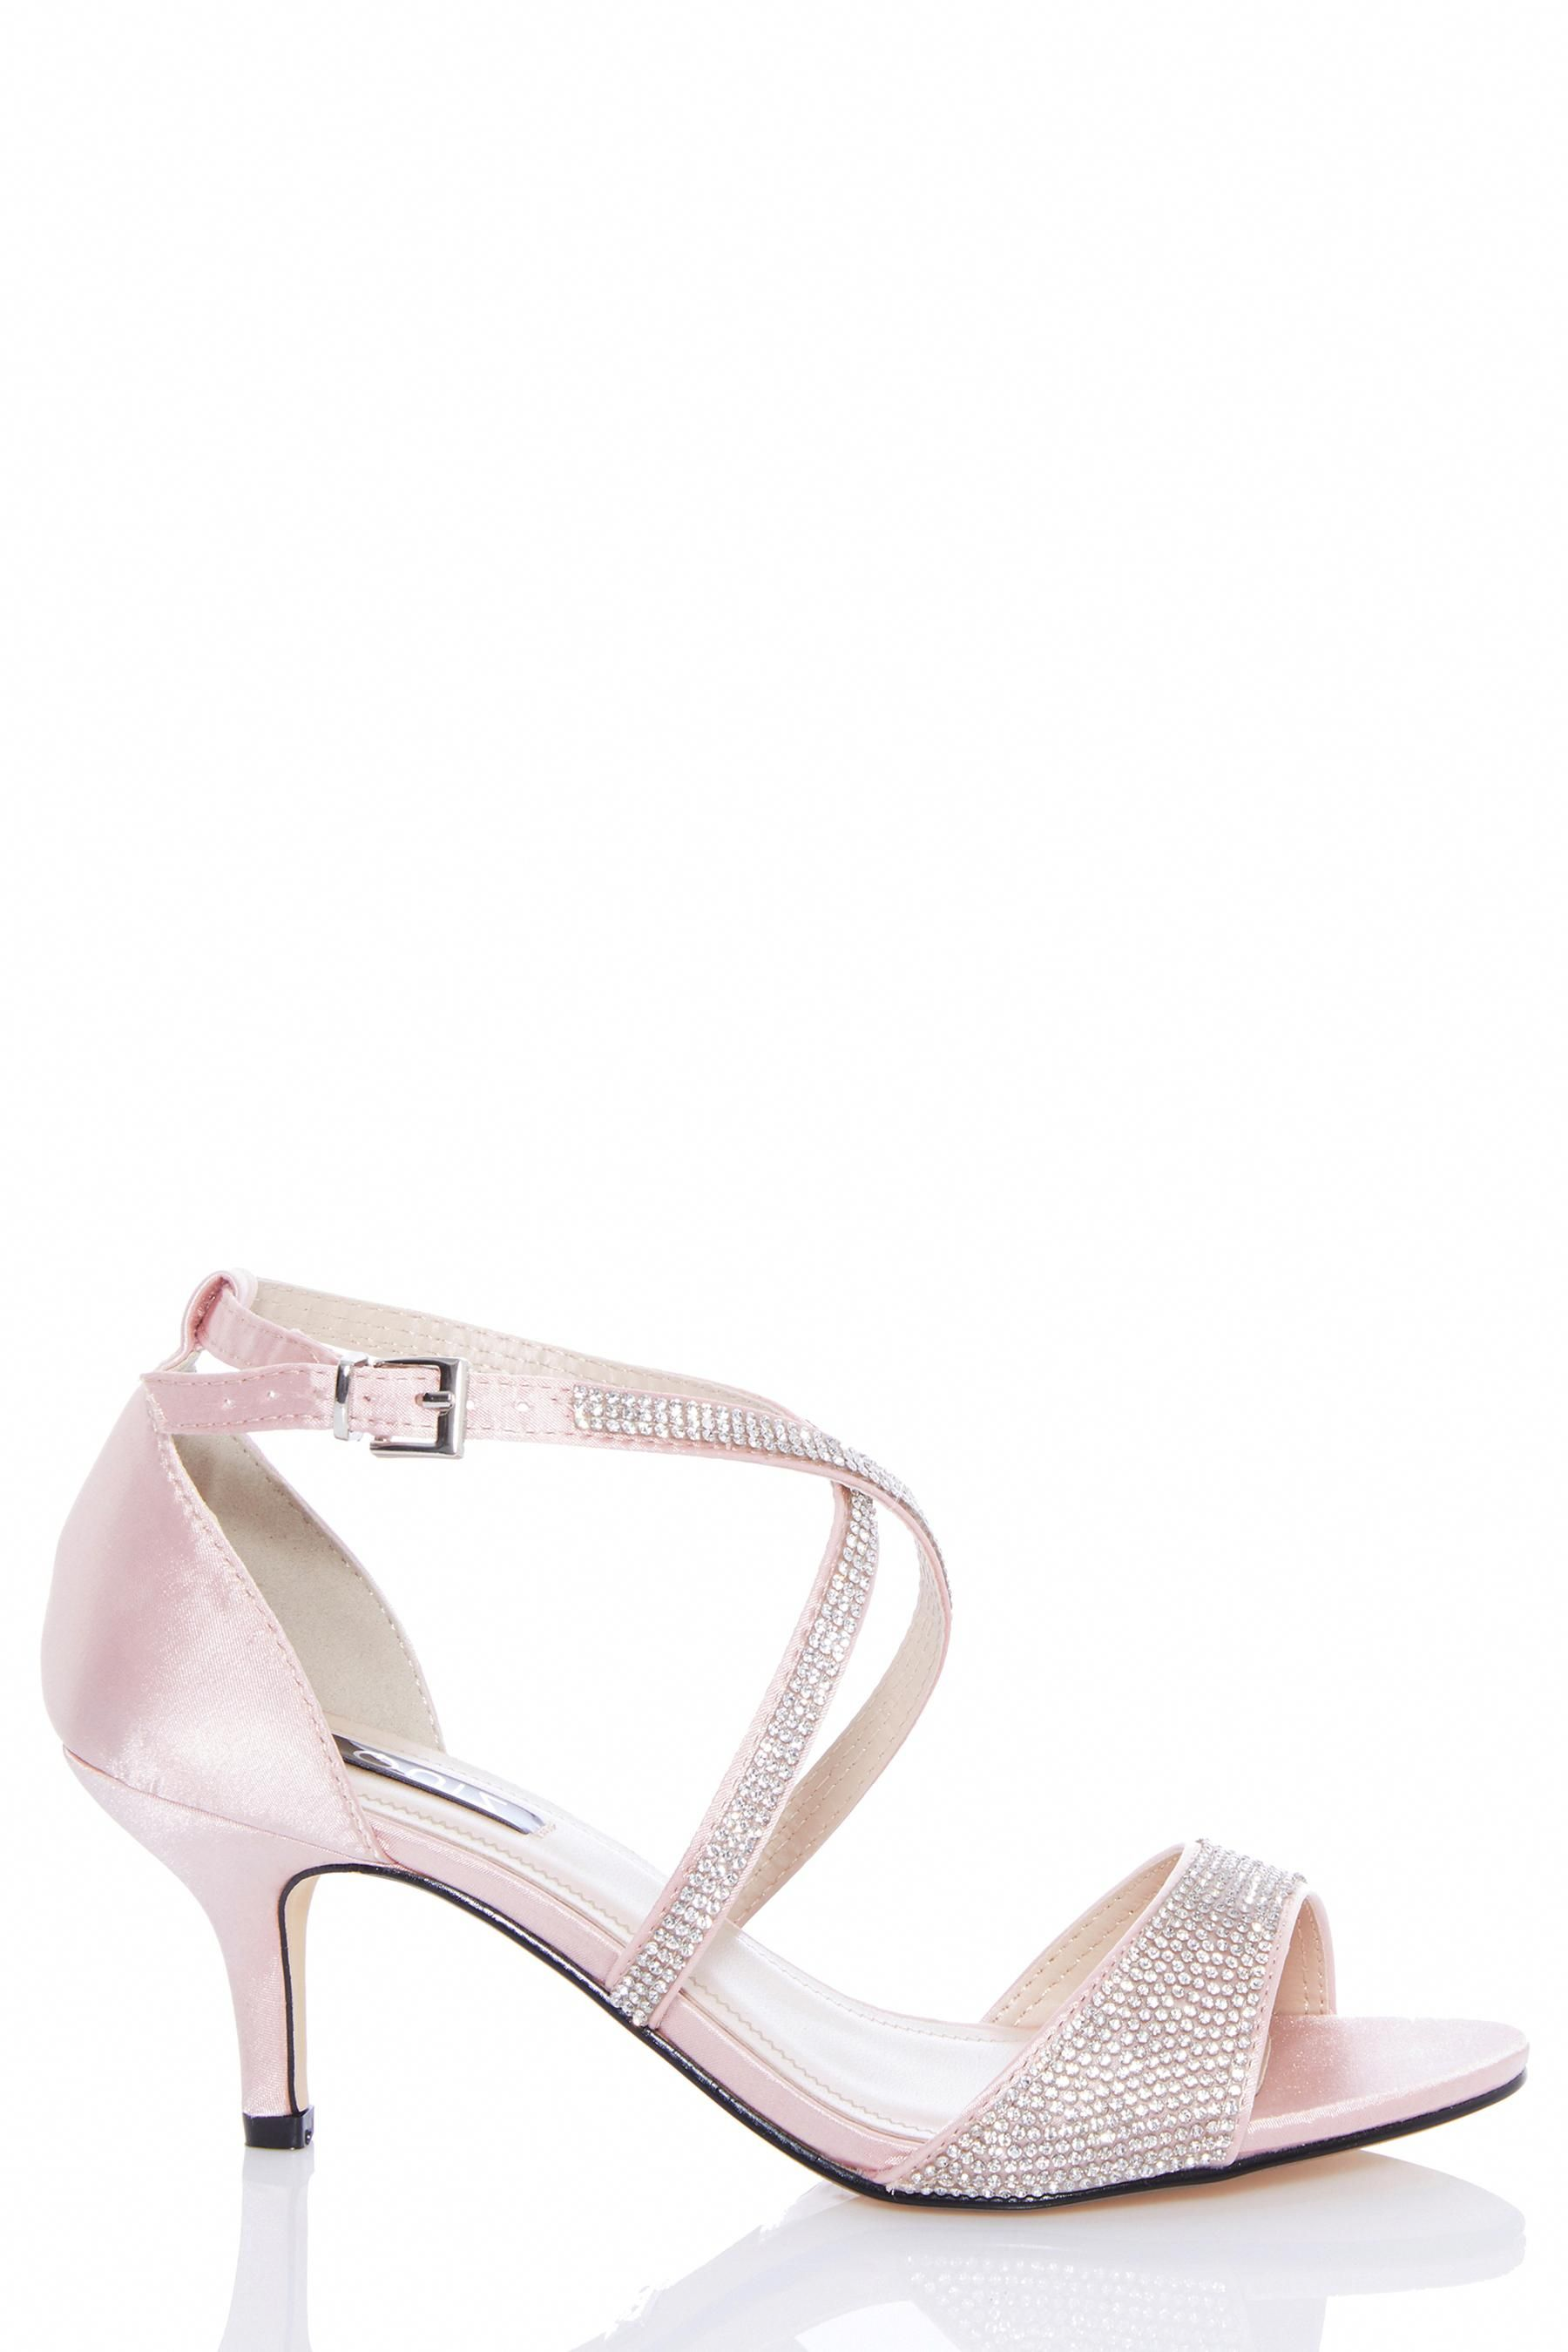 10e9d8aafd162 Womens Quiz Diamanté Low Heeled Sandals - Pink #SandalsHeels ...